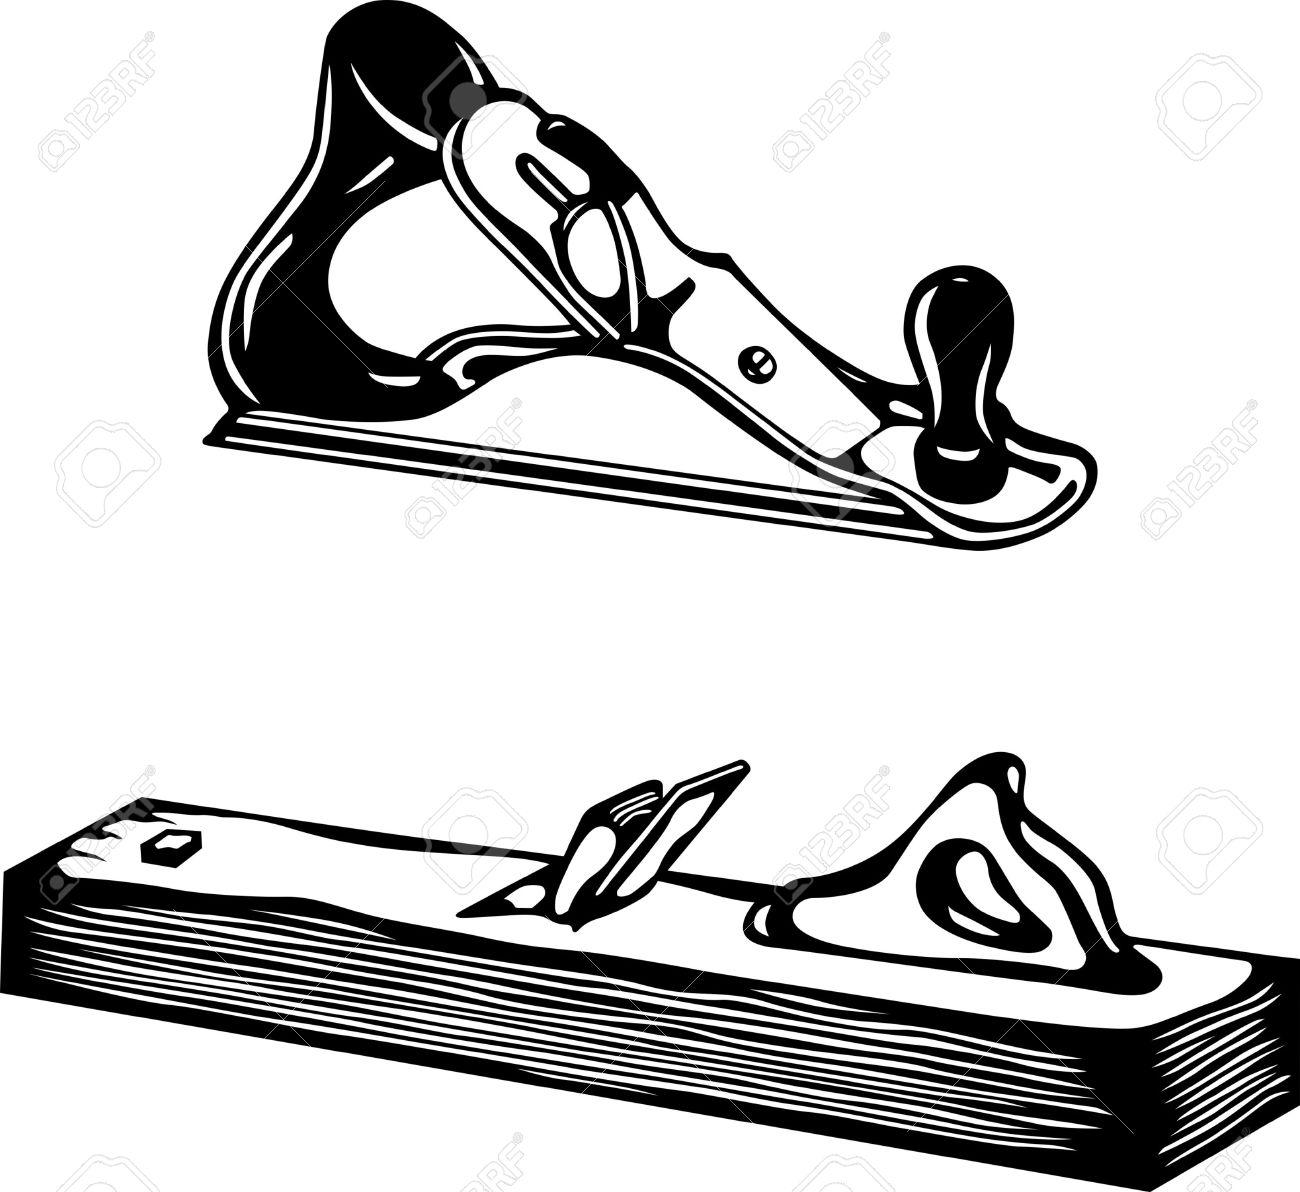 Carpenter clipart joiner, Picture #327892 carpenter clipart.